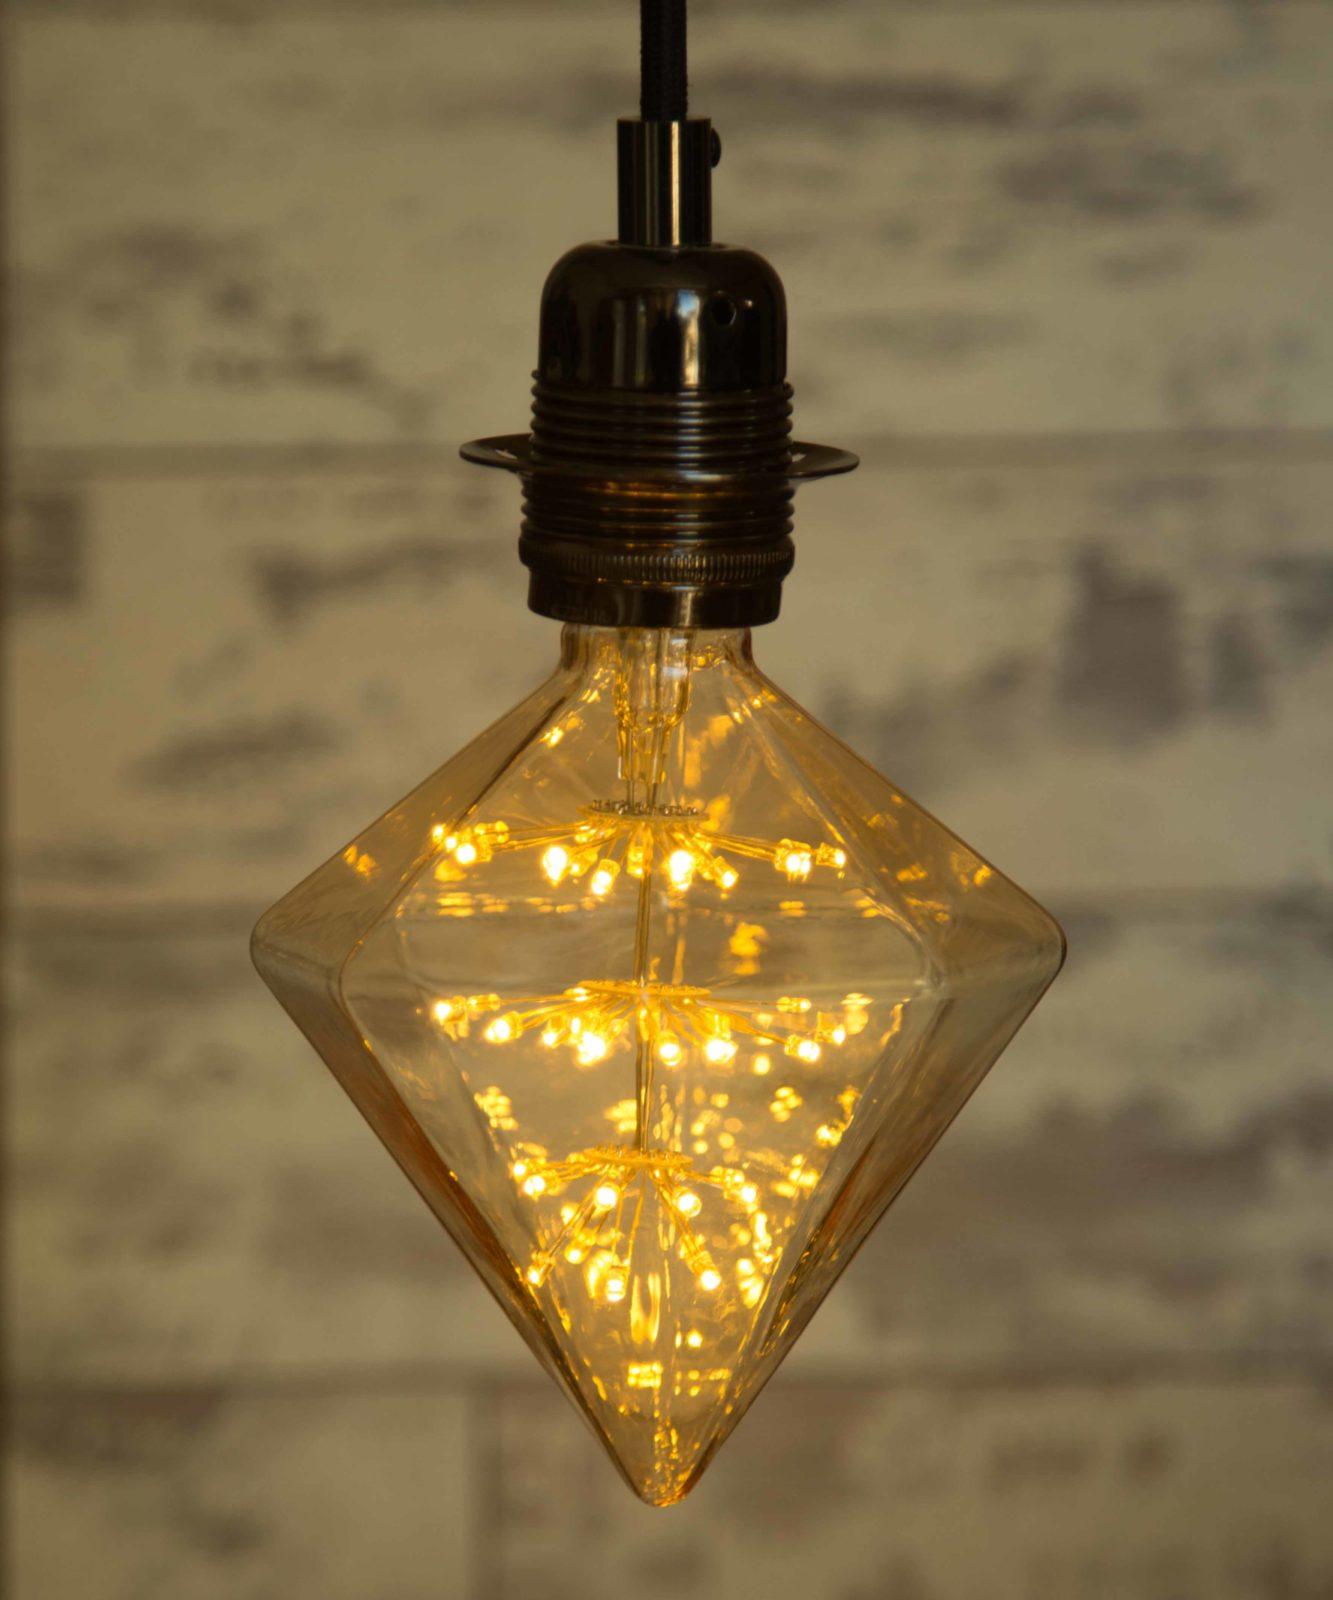 decorative extra large diamond star led light bulb 3w long life. Black Bedroom Furniture Sets. Home Design Ideas